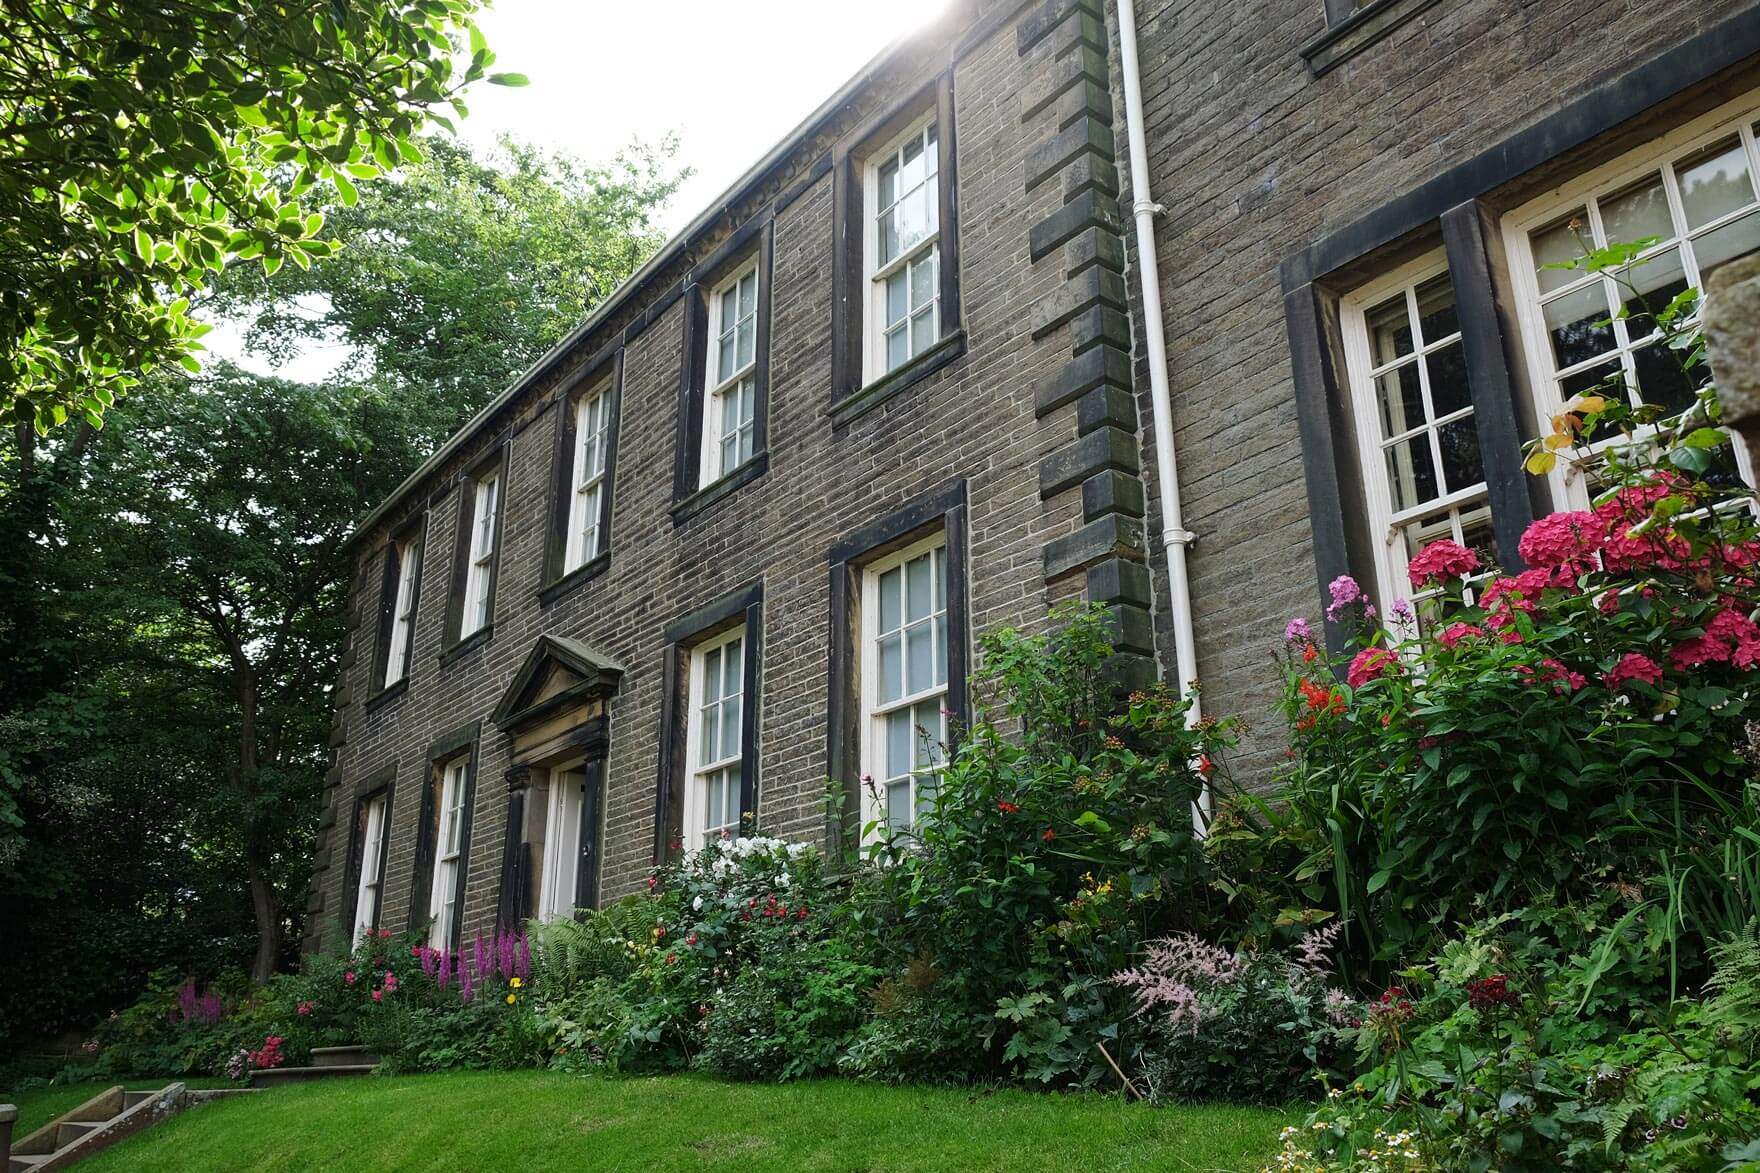 The Brontë Parsonage Museum in Haworth